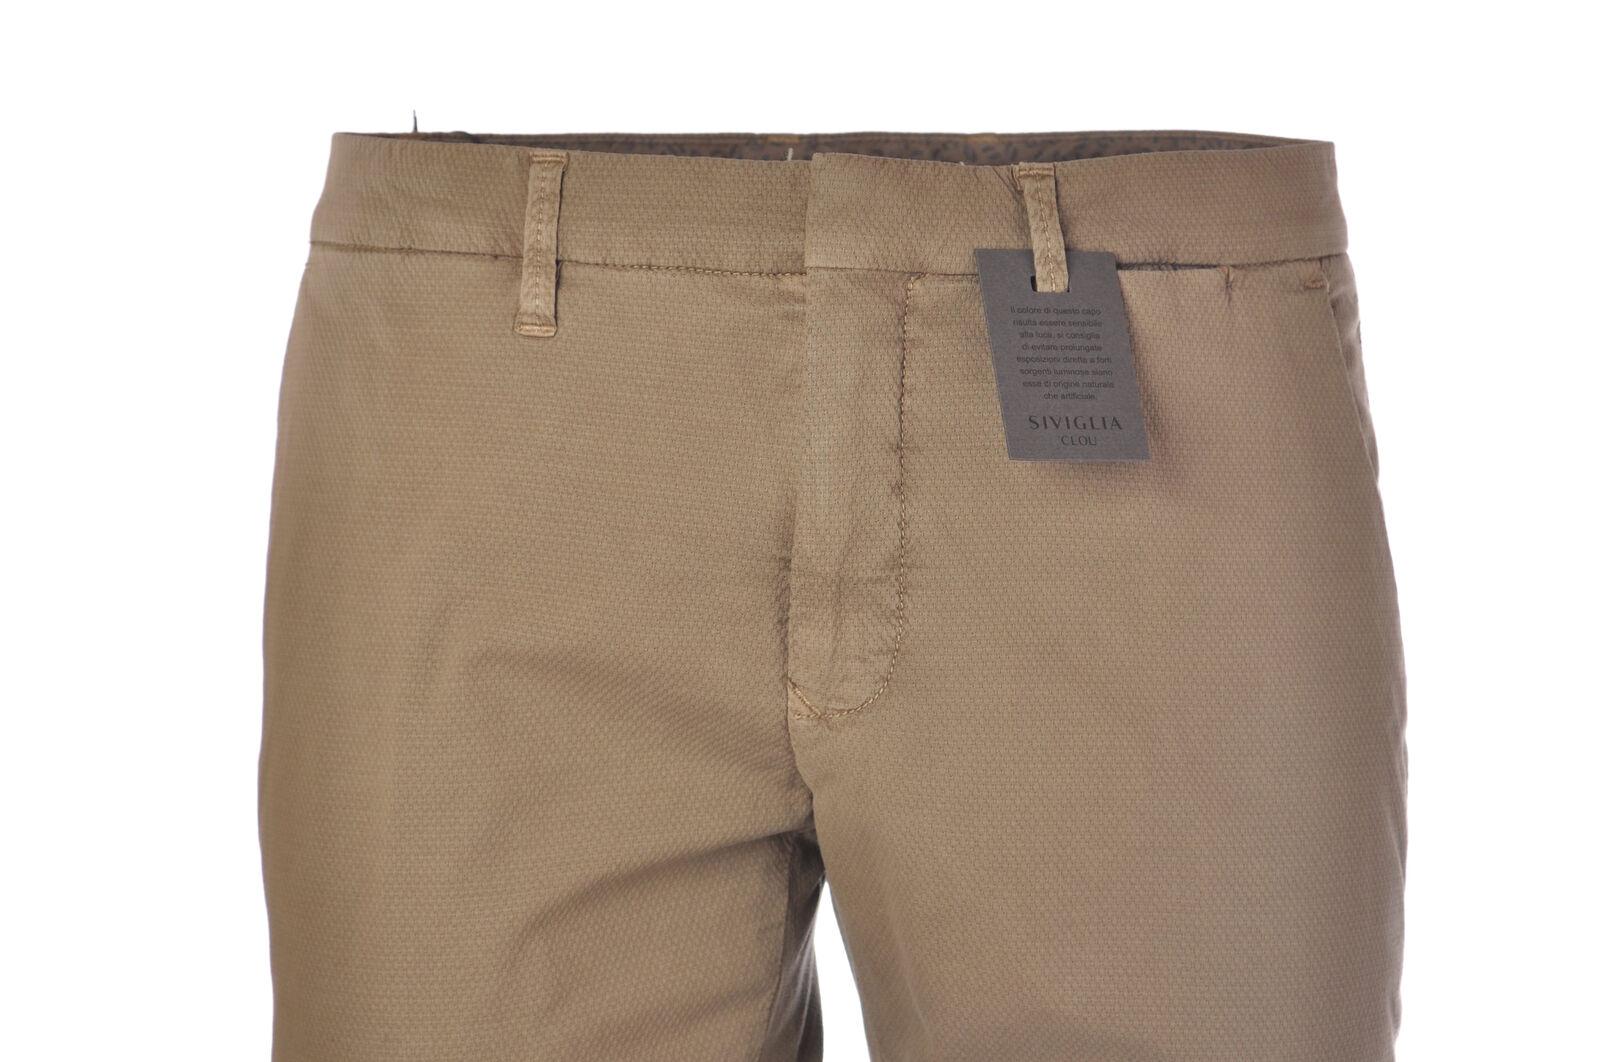 Siviglia - Beige Pantaloni-Pantaloni - Uomo - Beige - - 5064615G185716 57cdbf